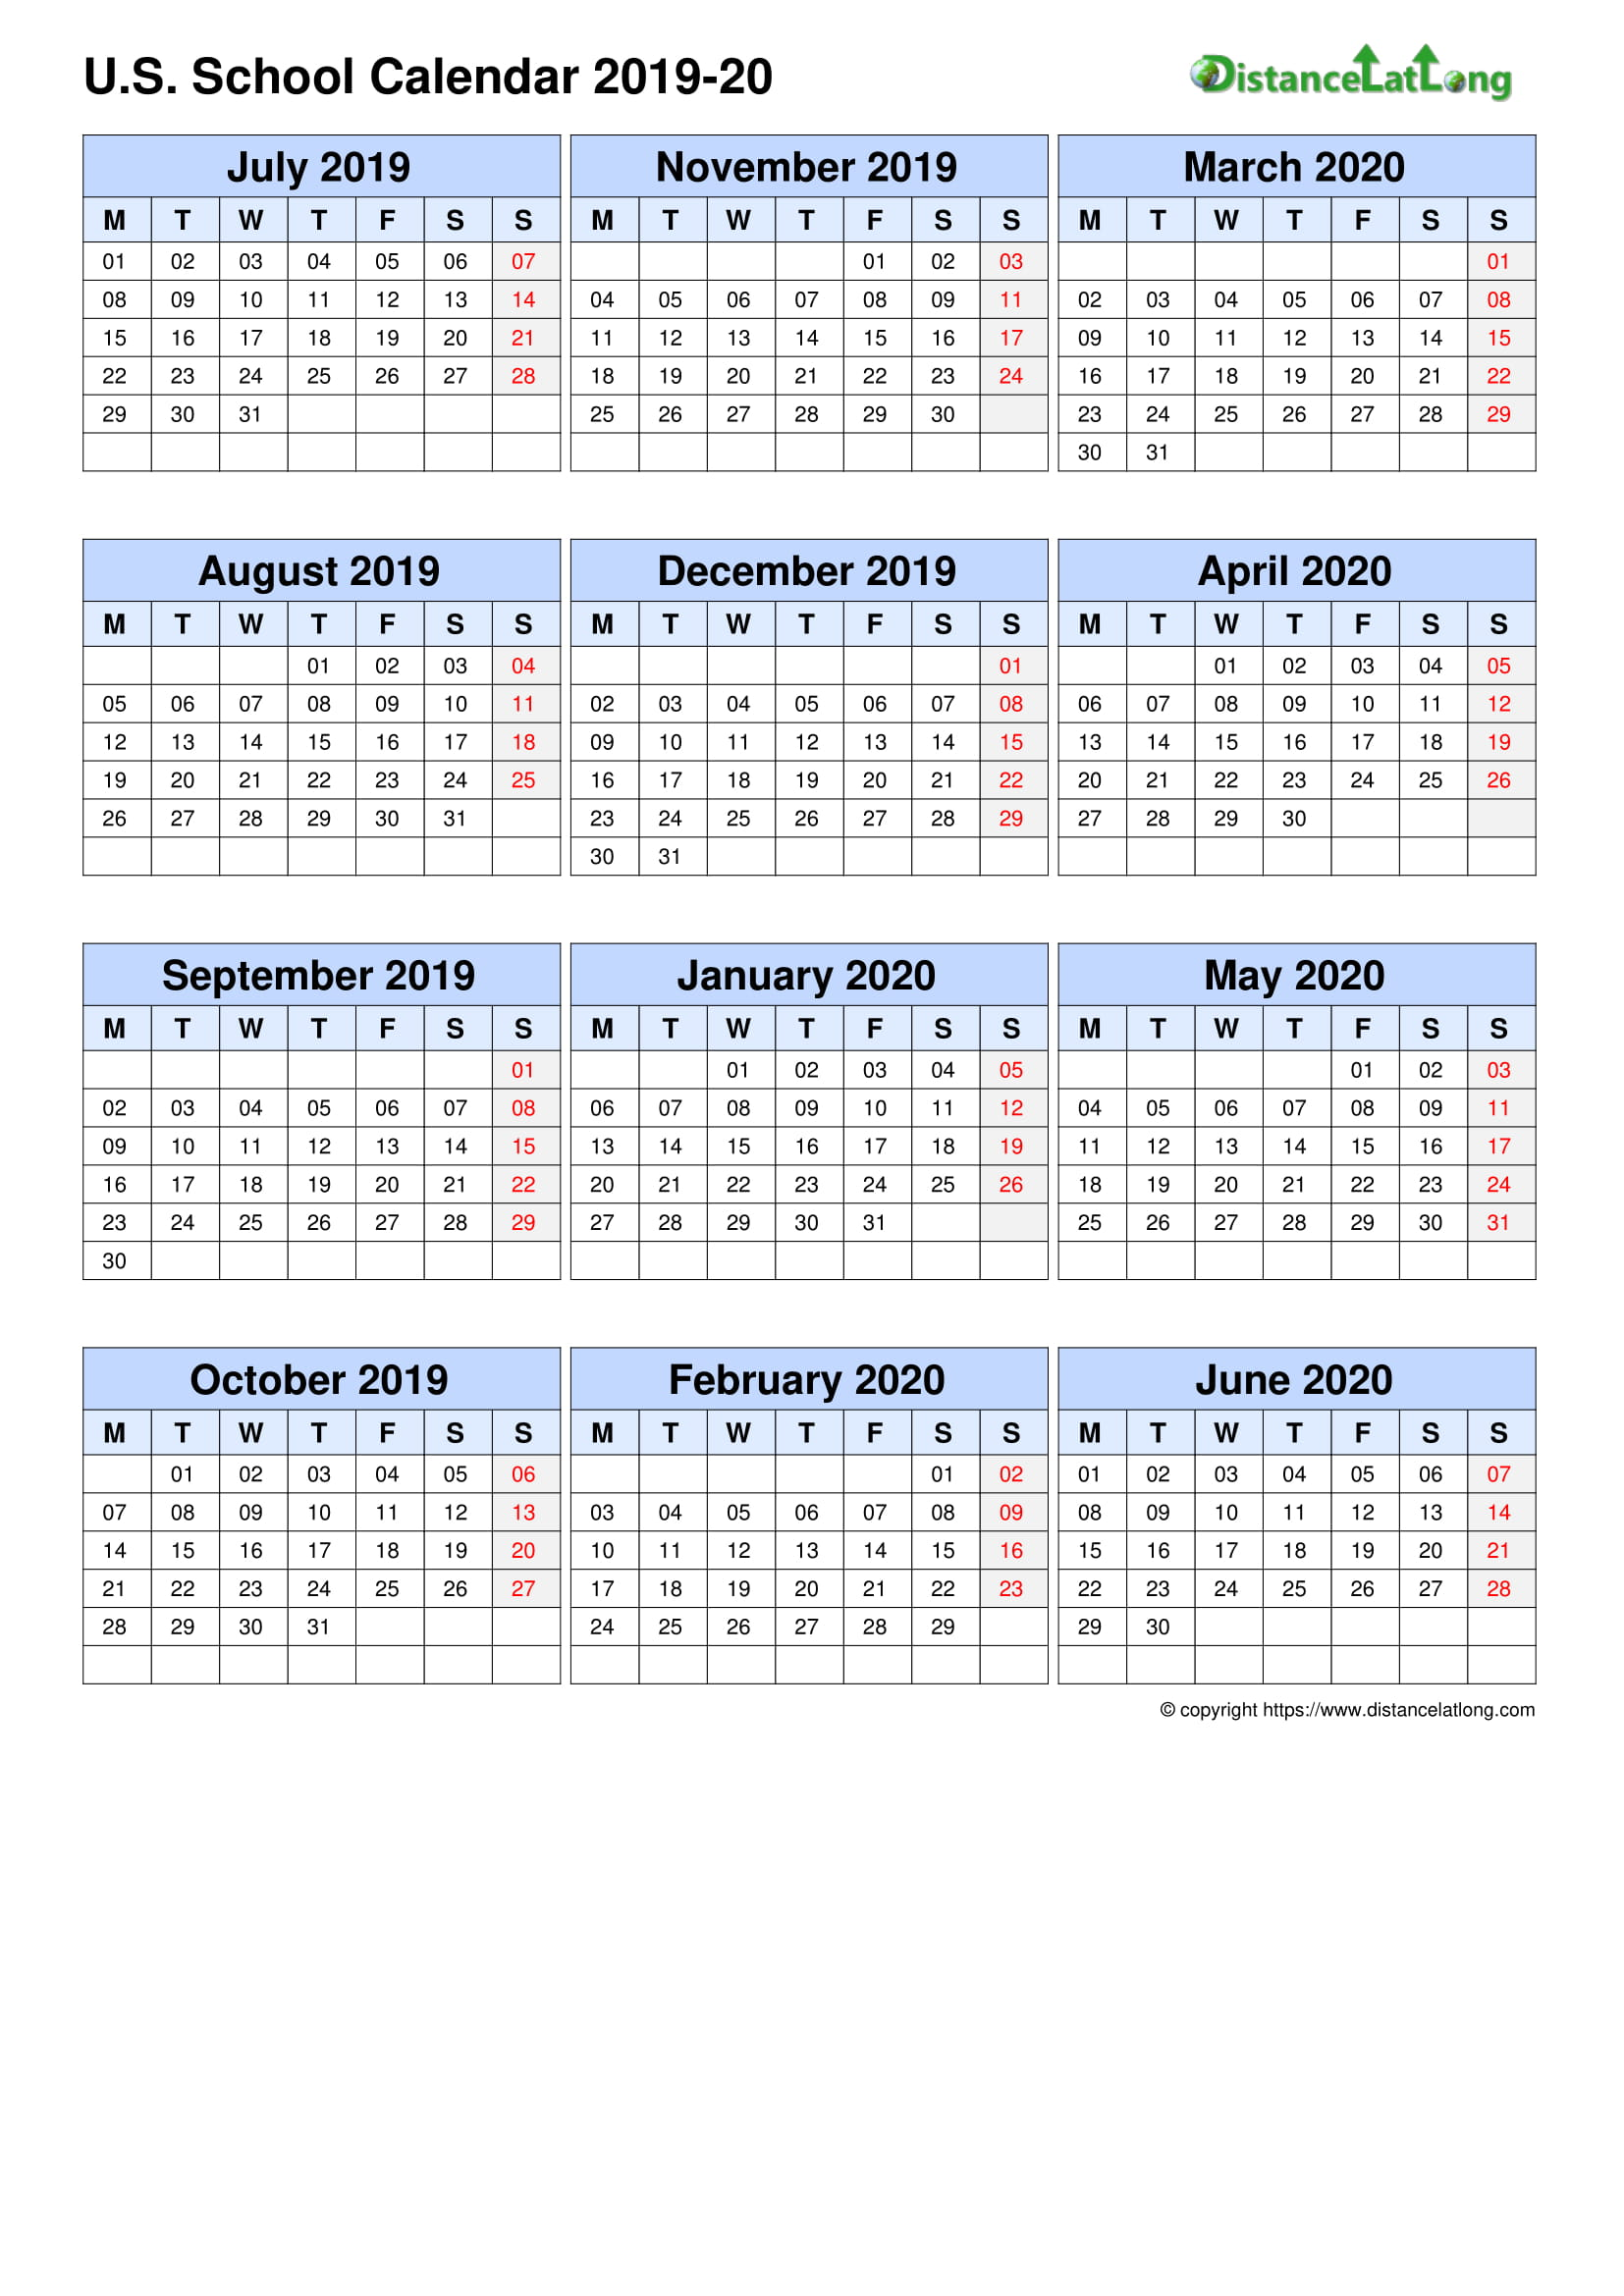 2020 School Calendar School Portrait Orientation Free Printable Templates Free Download Distancelatlong Com